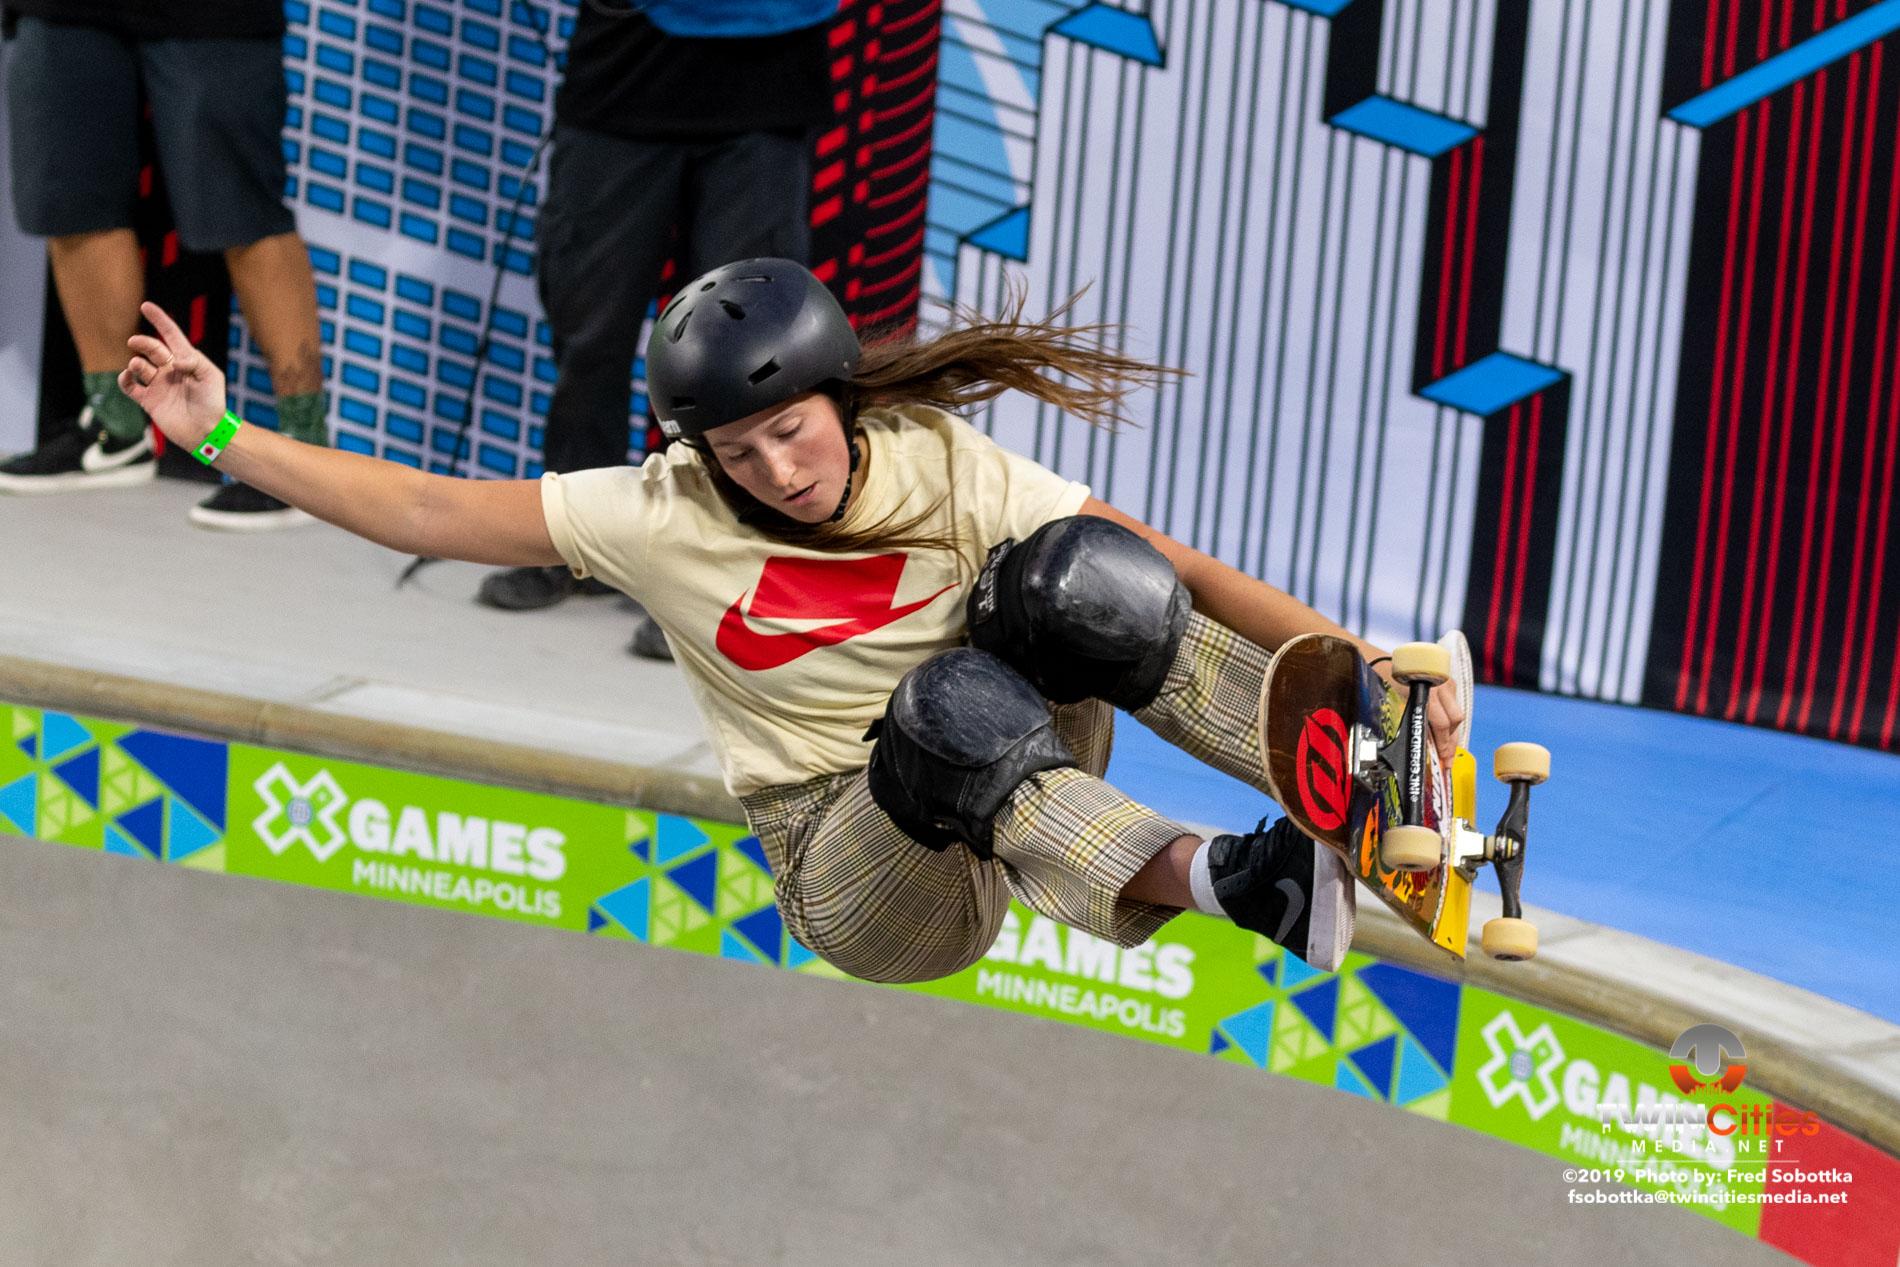 Womens-Skateboard-Park-09